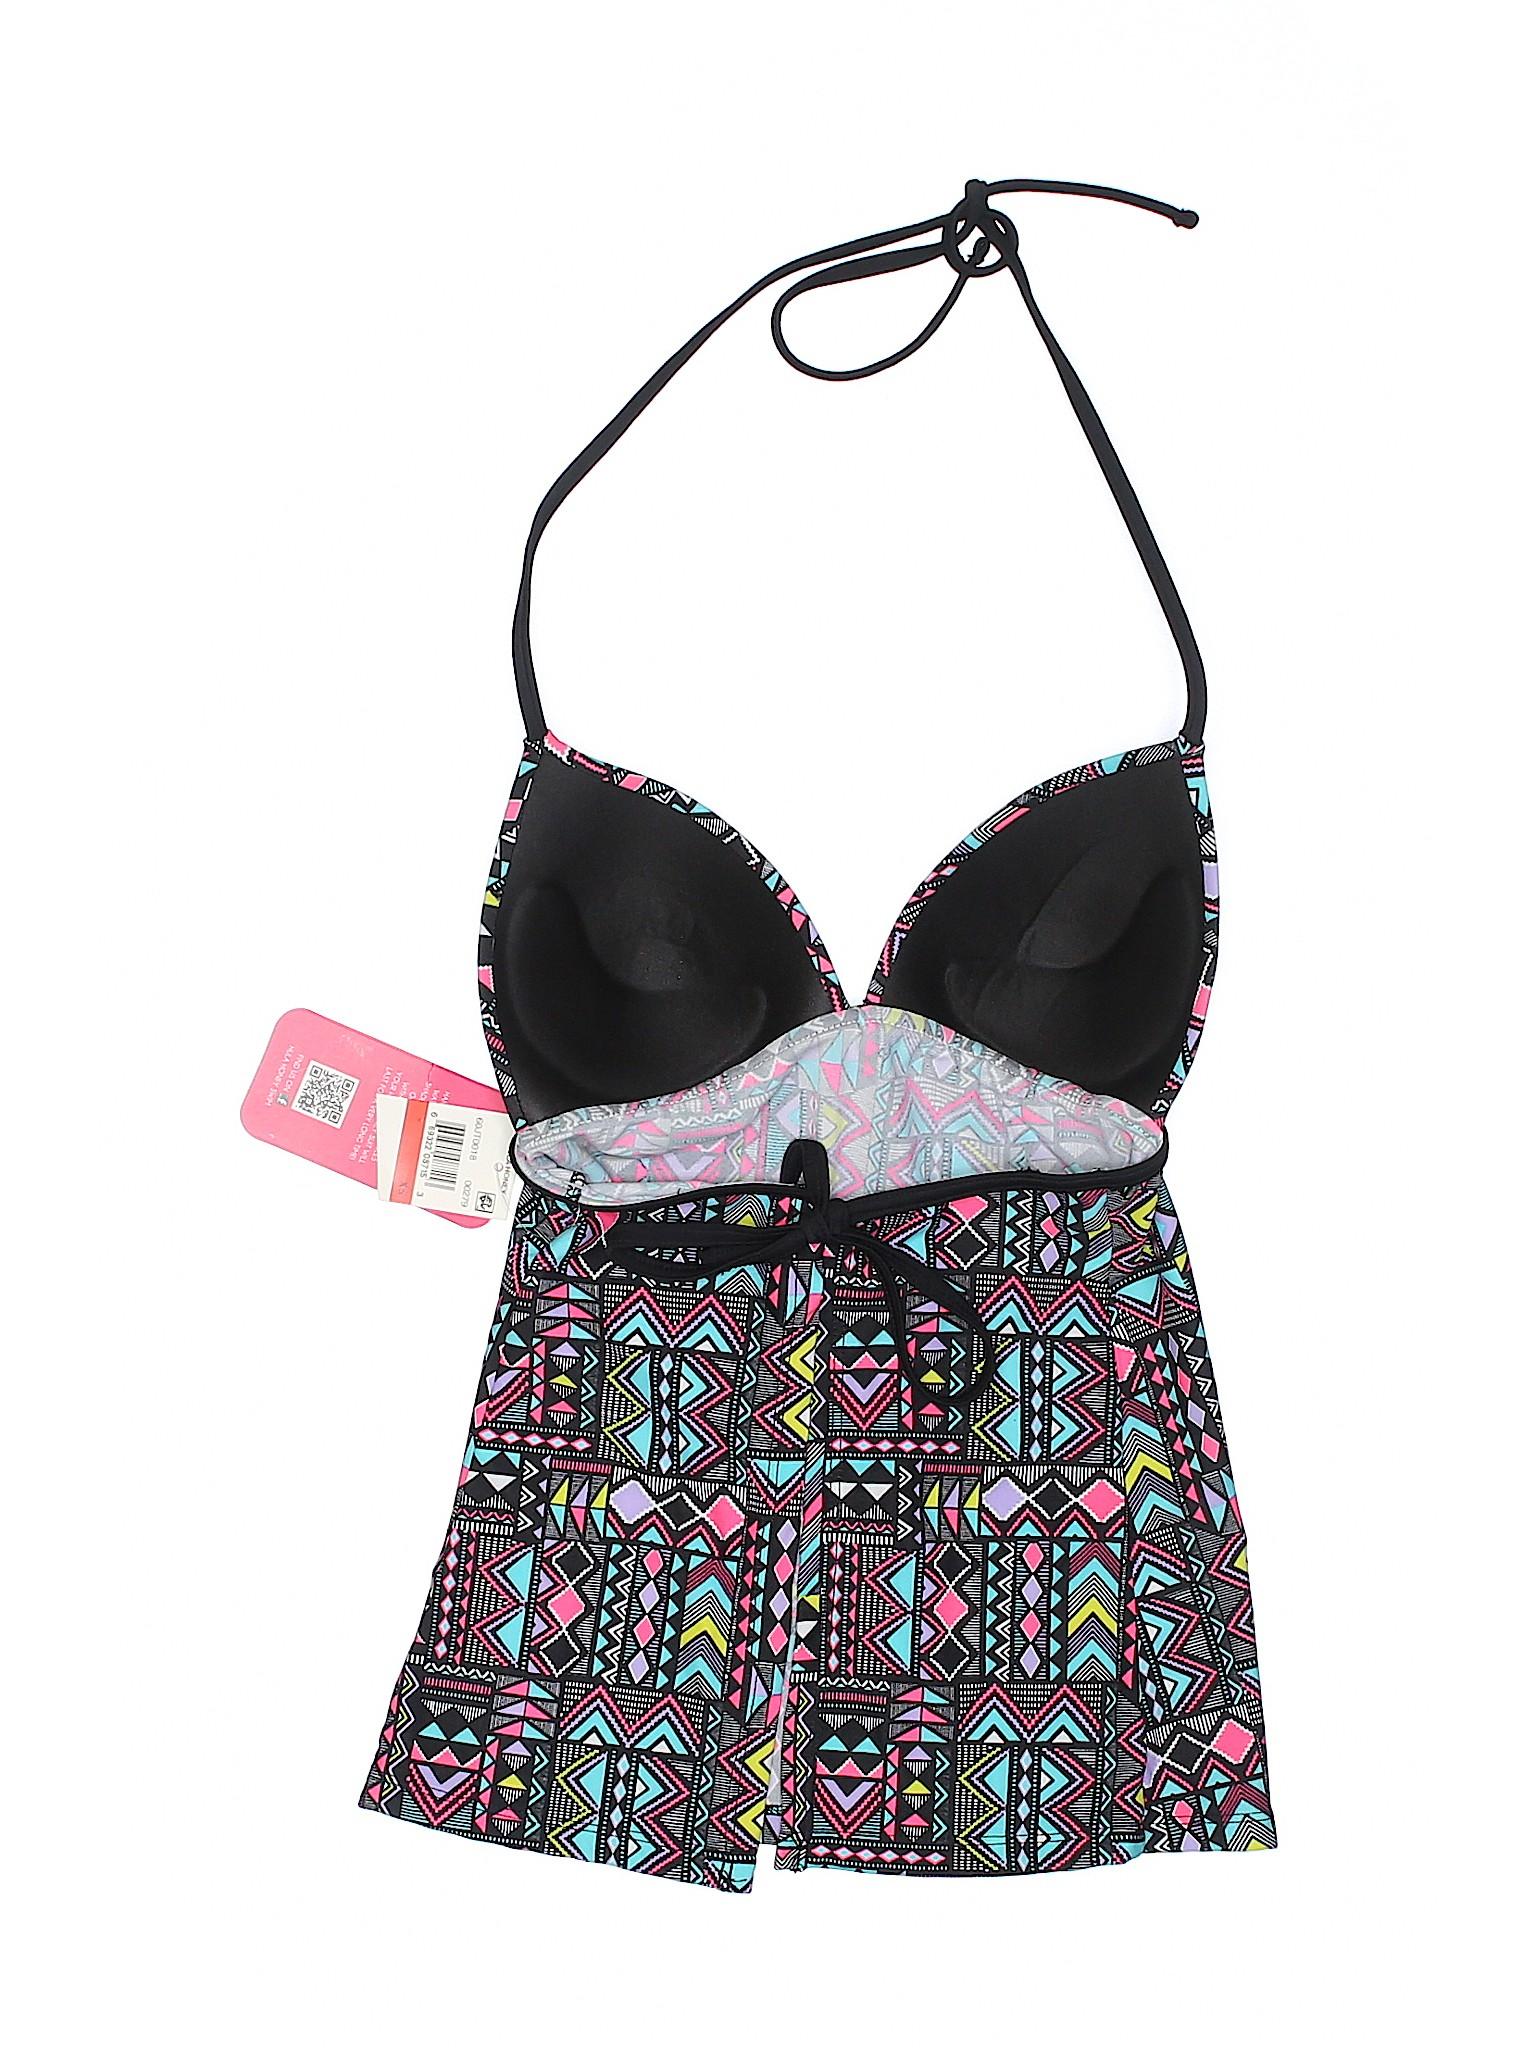 Boutique Hula Swimsuit Honey Hula Swimsuit Top Top Boutique Honey q7tFCww